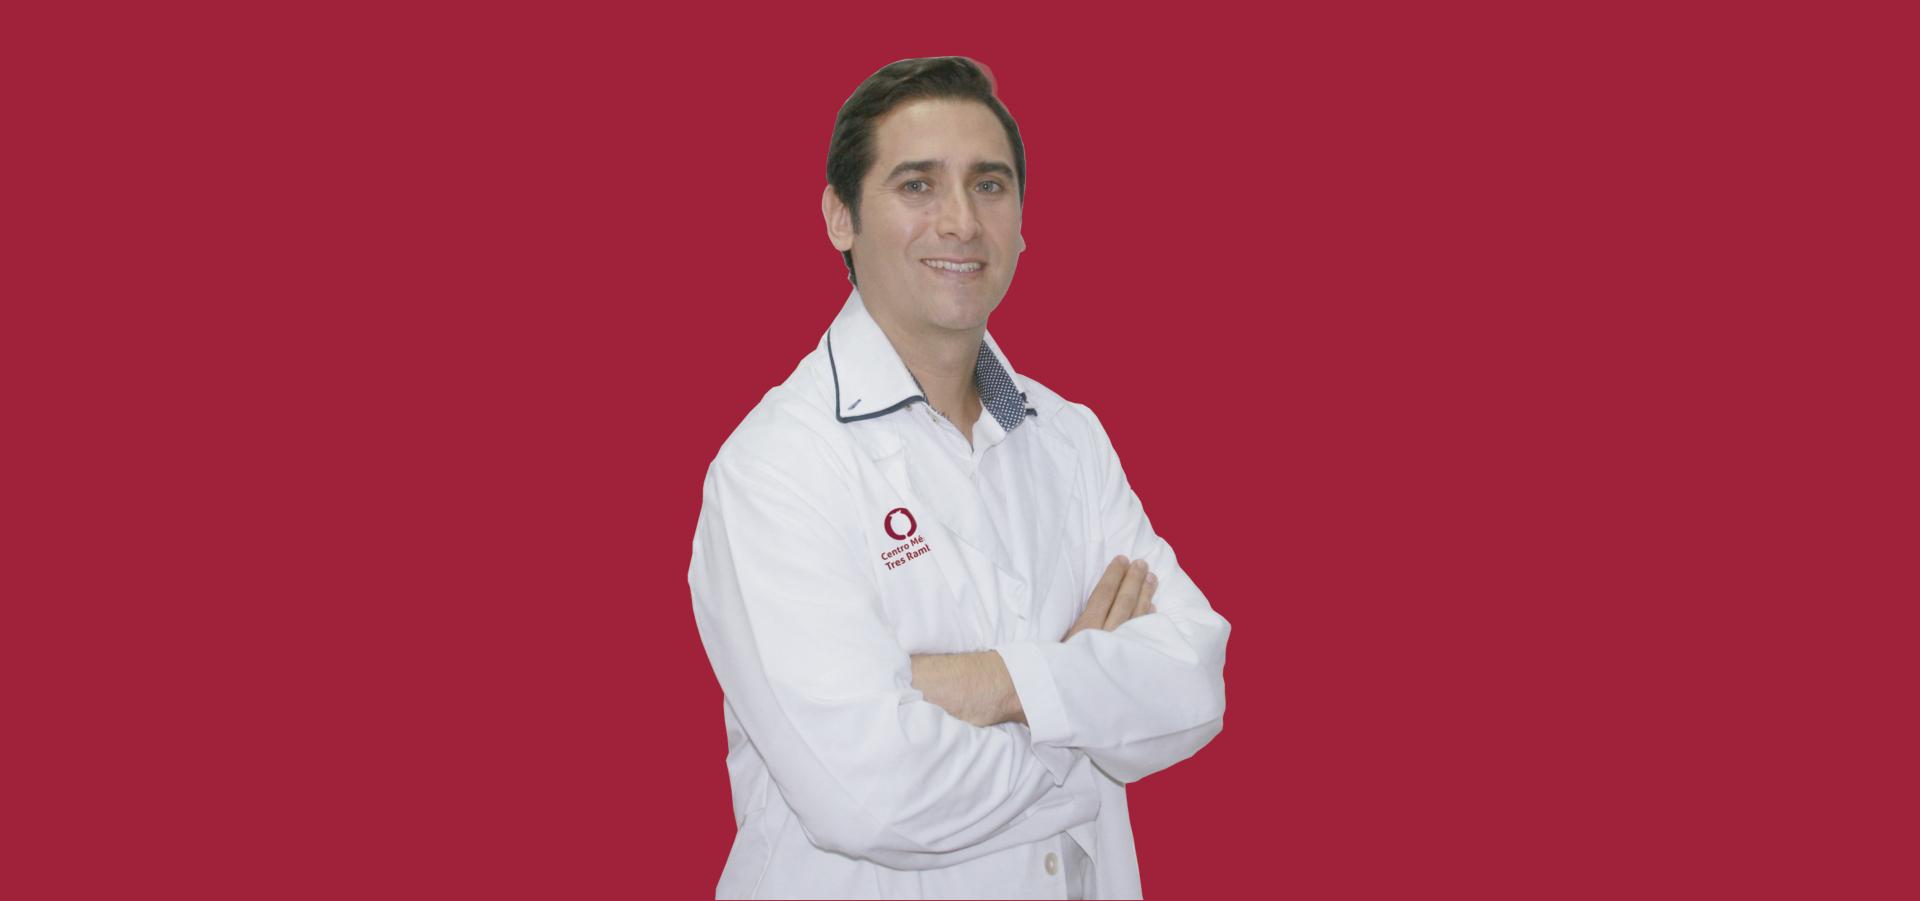 Dr. Felipe Castillo Muñoz